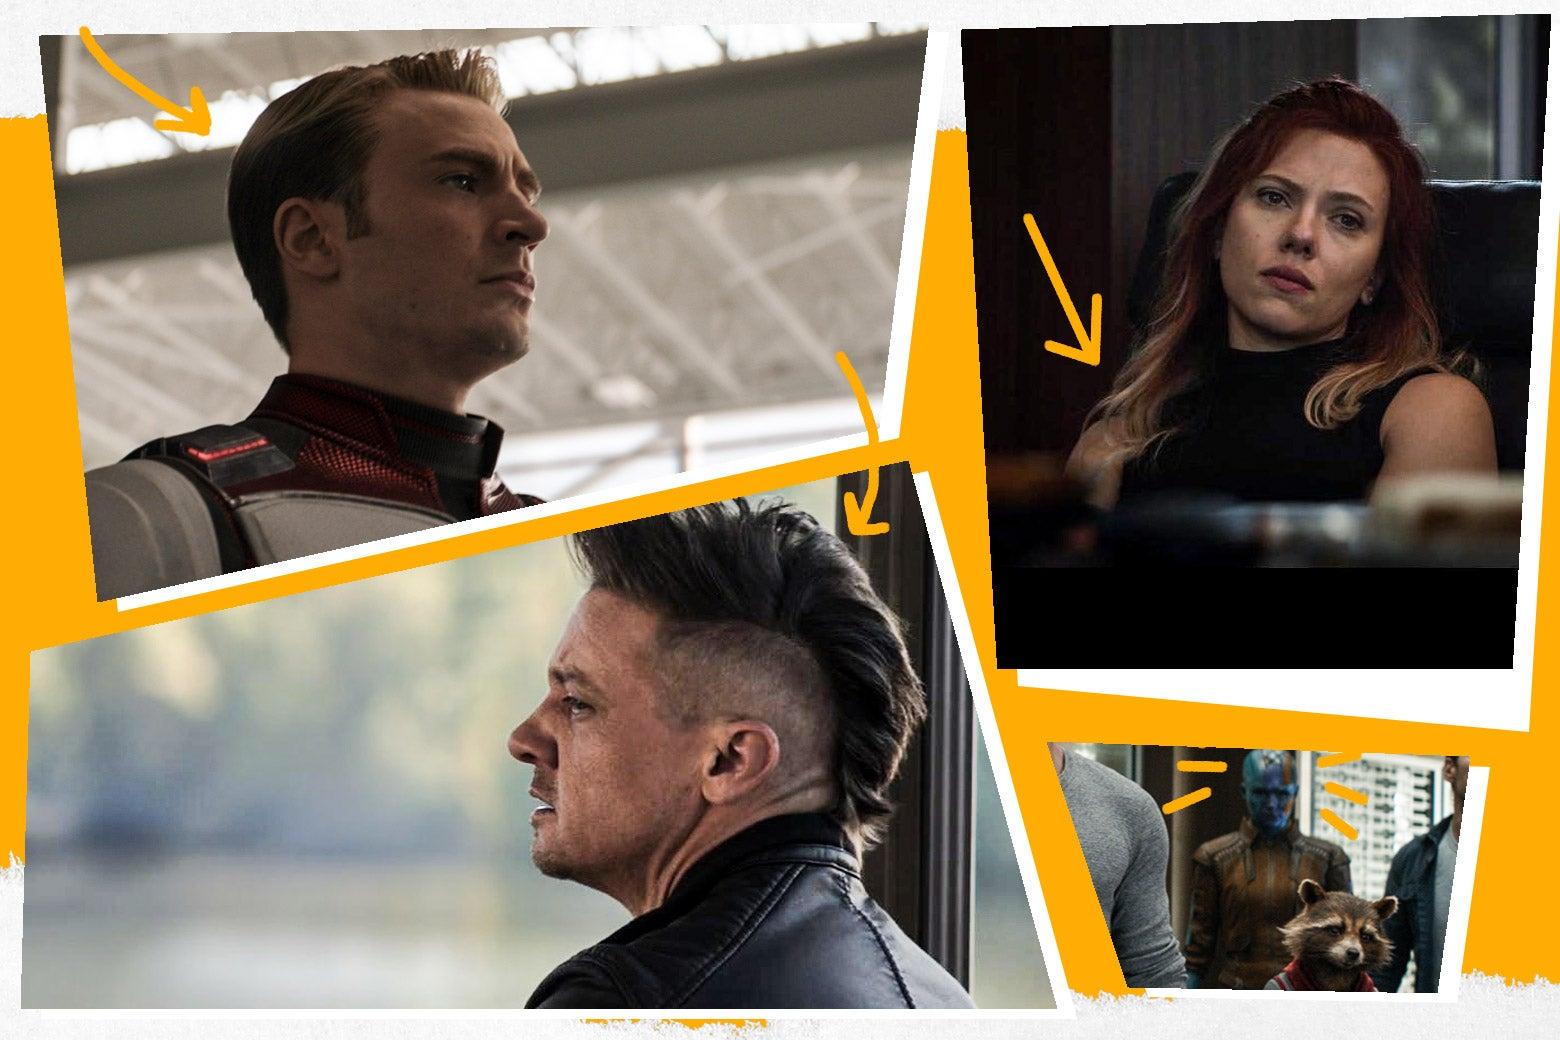 The hairstyles of Captain America, Black Widow, Hawkeye, and Nebula in Avengers: Endgame.